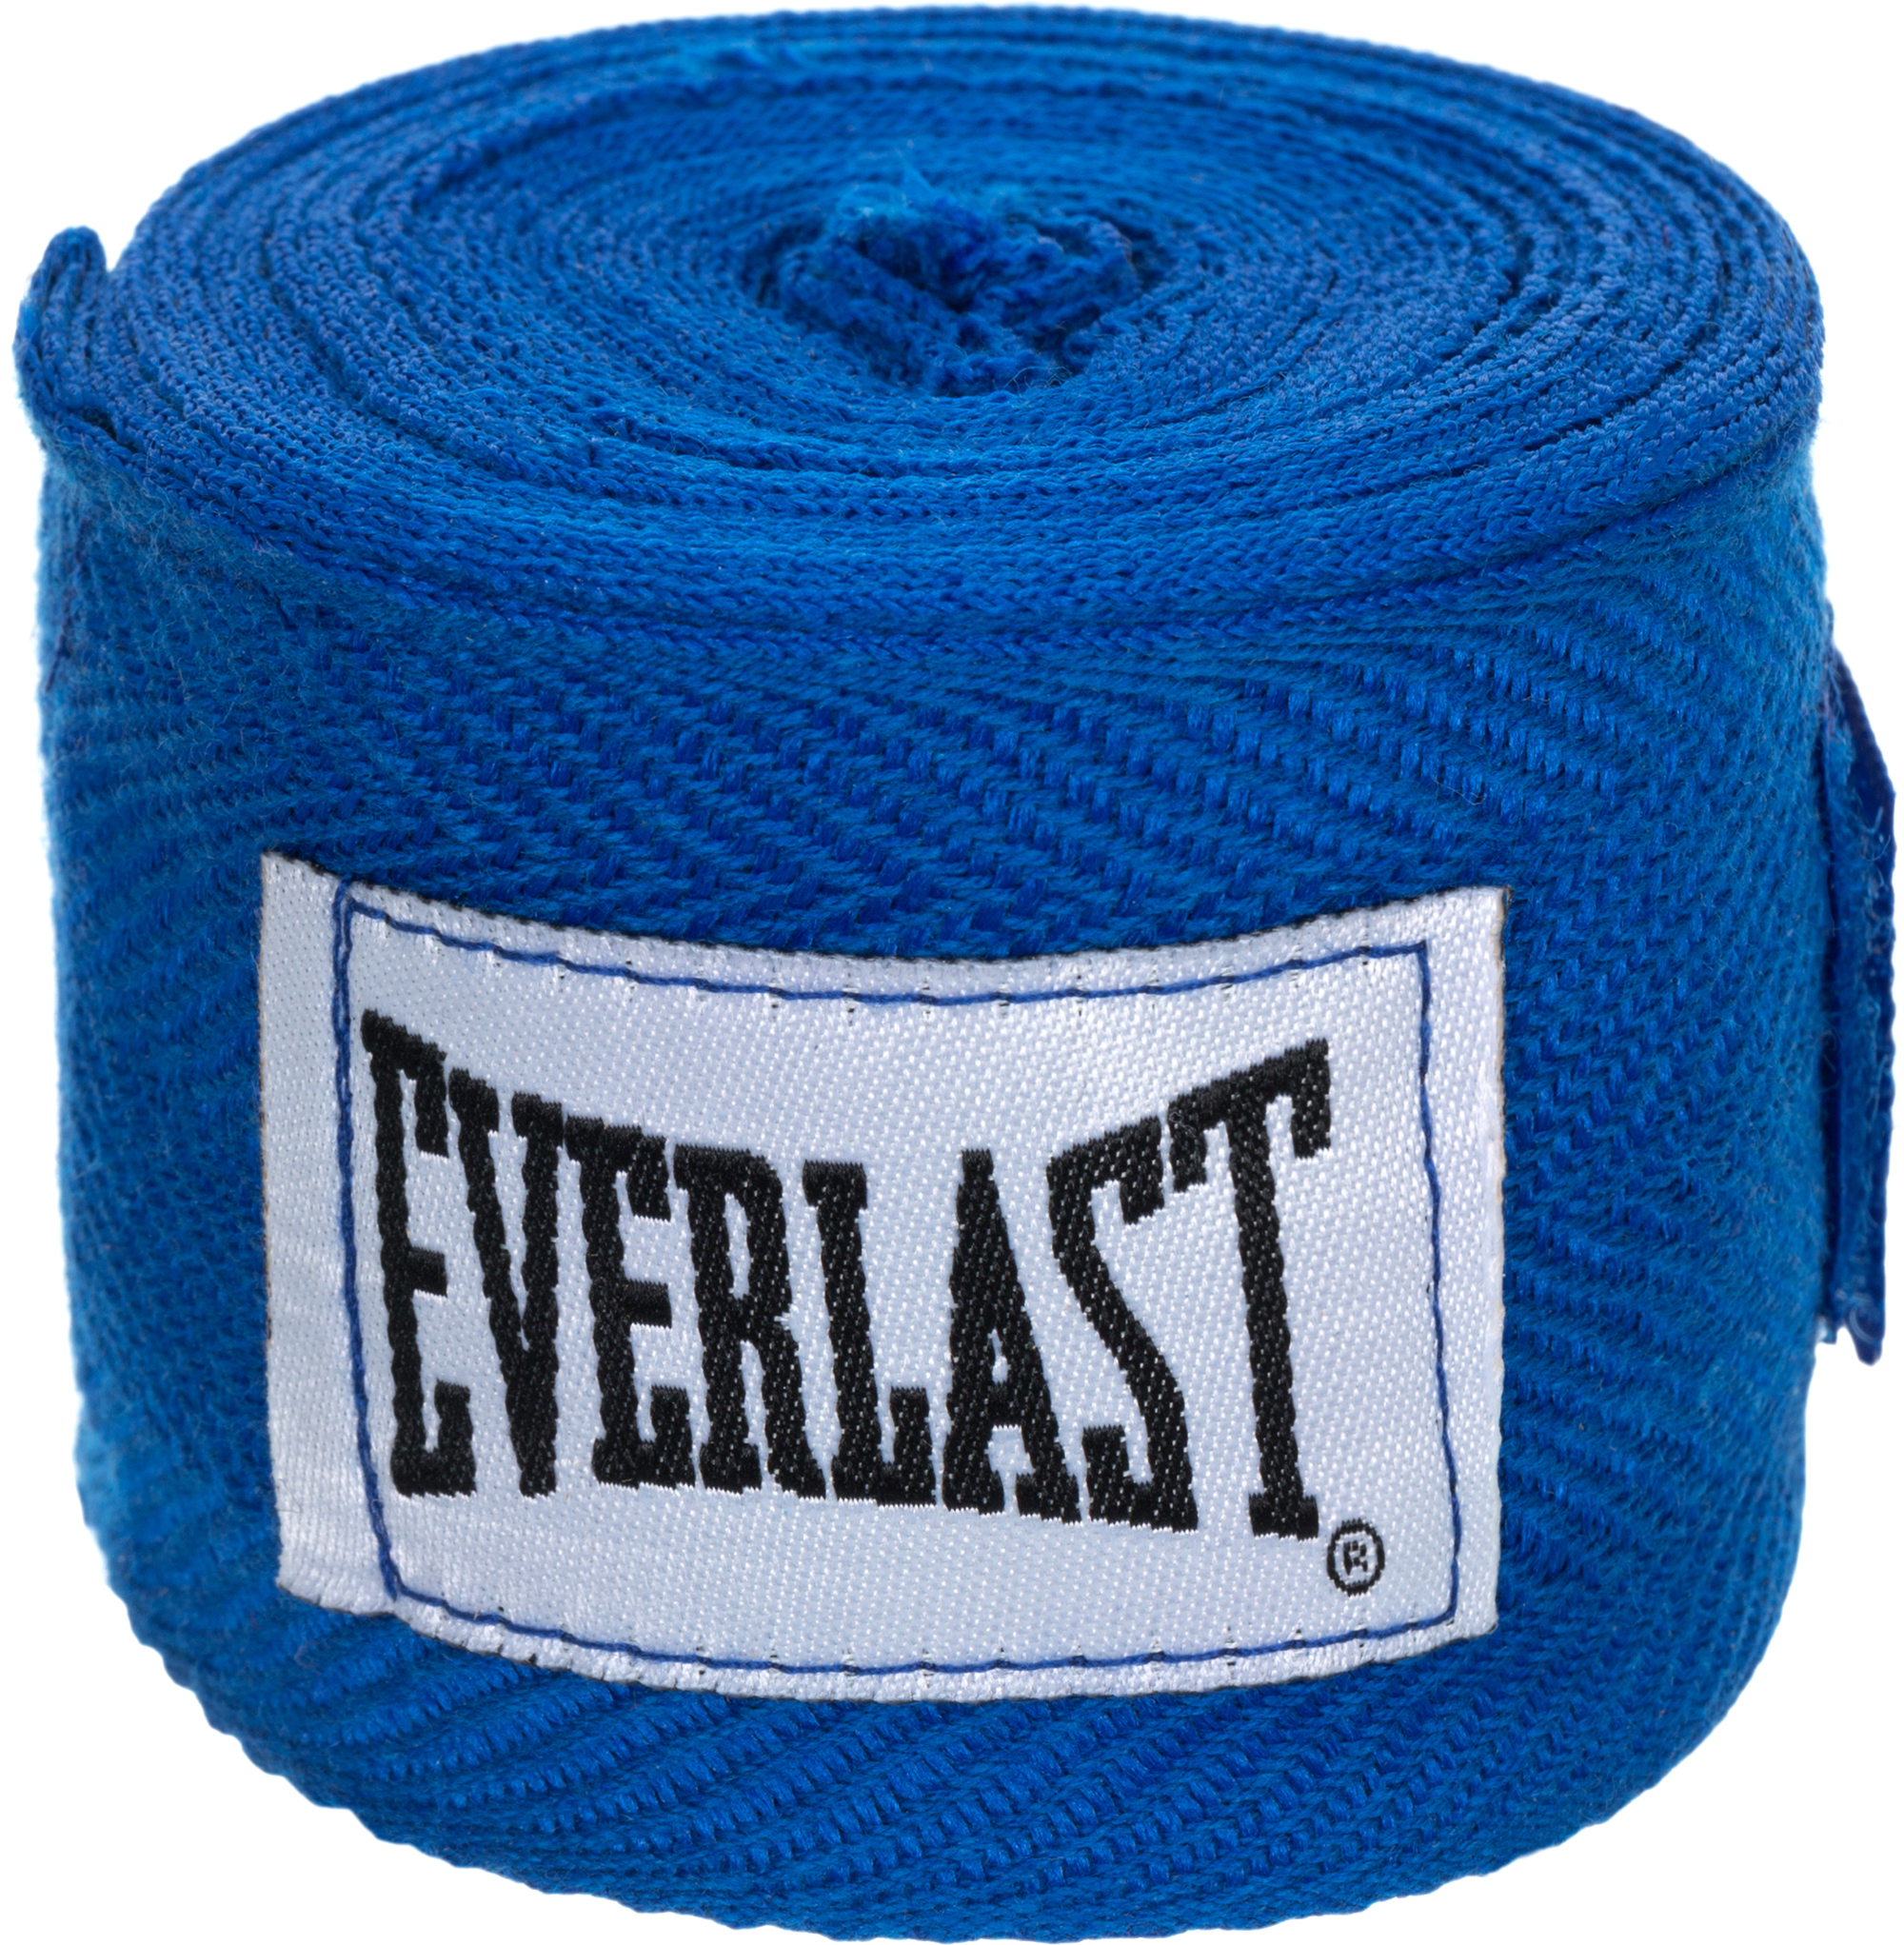 Everlast Бинты Everlast 2,5 м, 2 шт., размер Без размера